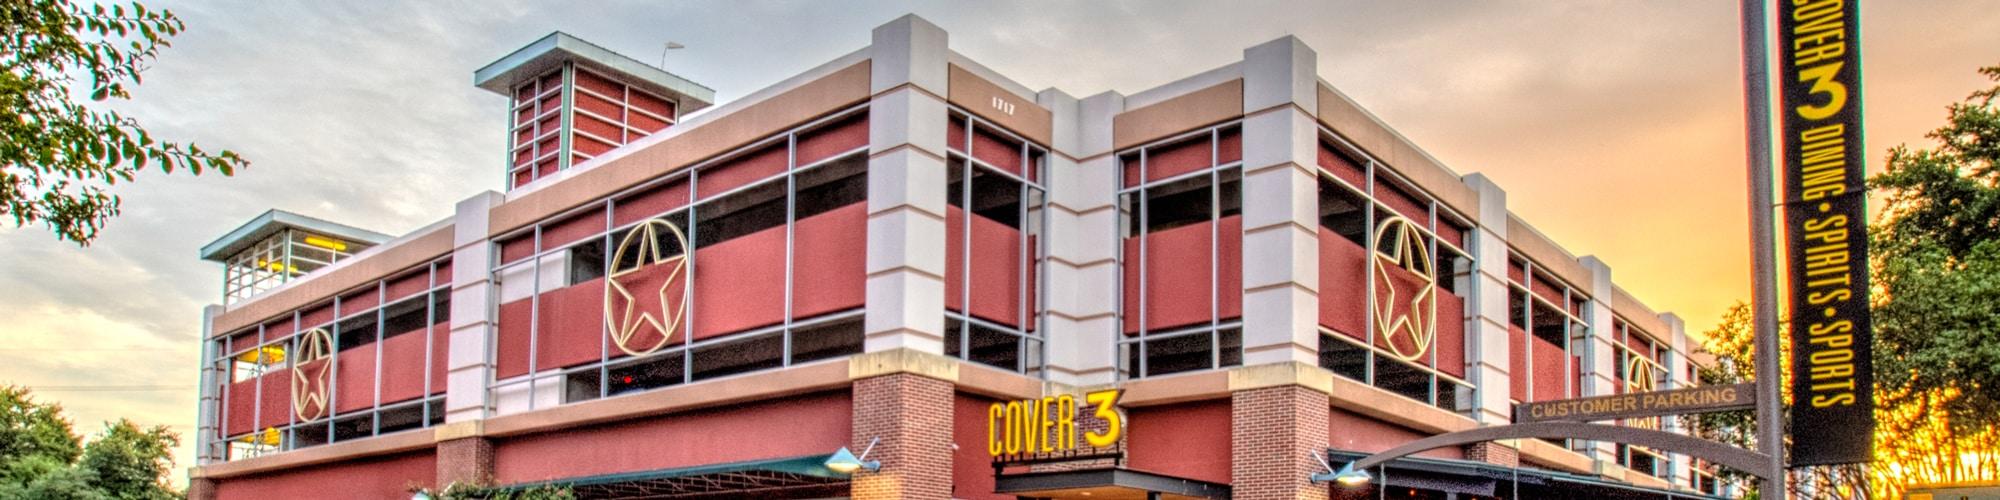 Hartland Plaza Shops Parking Garage | 1717 W. 6th Street in Austin, Texas